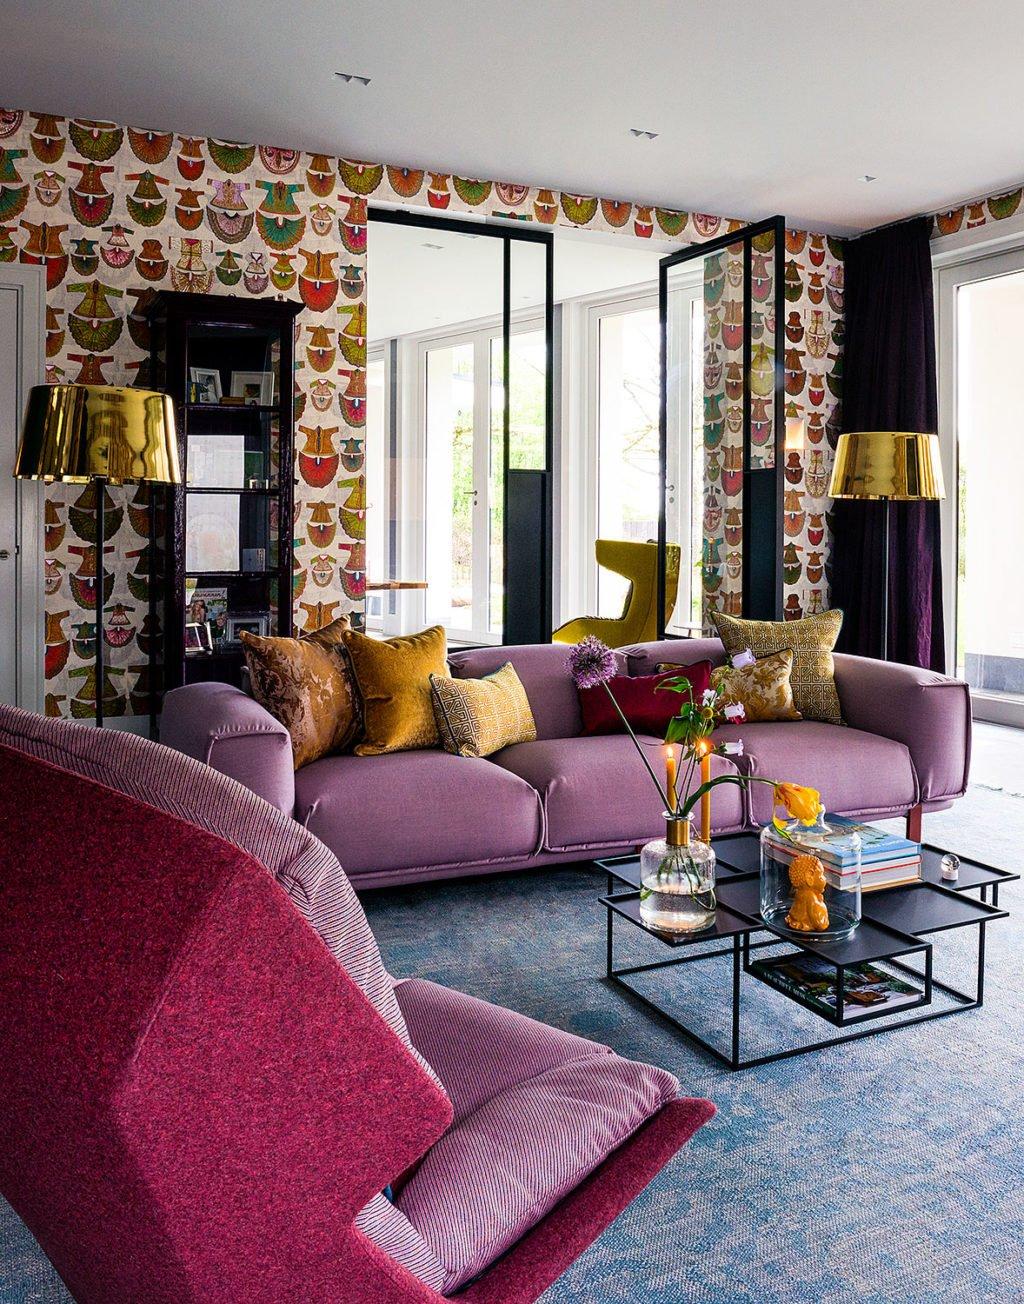 dutch interior design pink sofa chair gold pillow